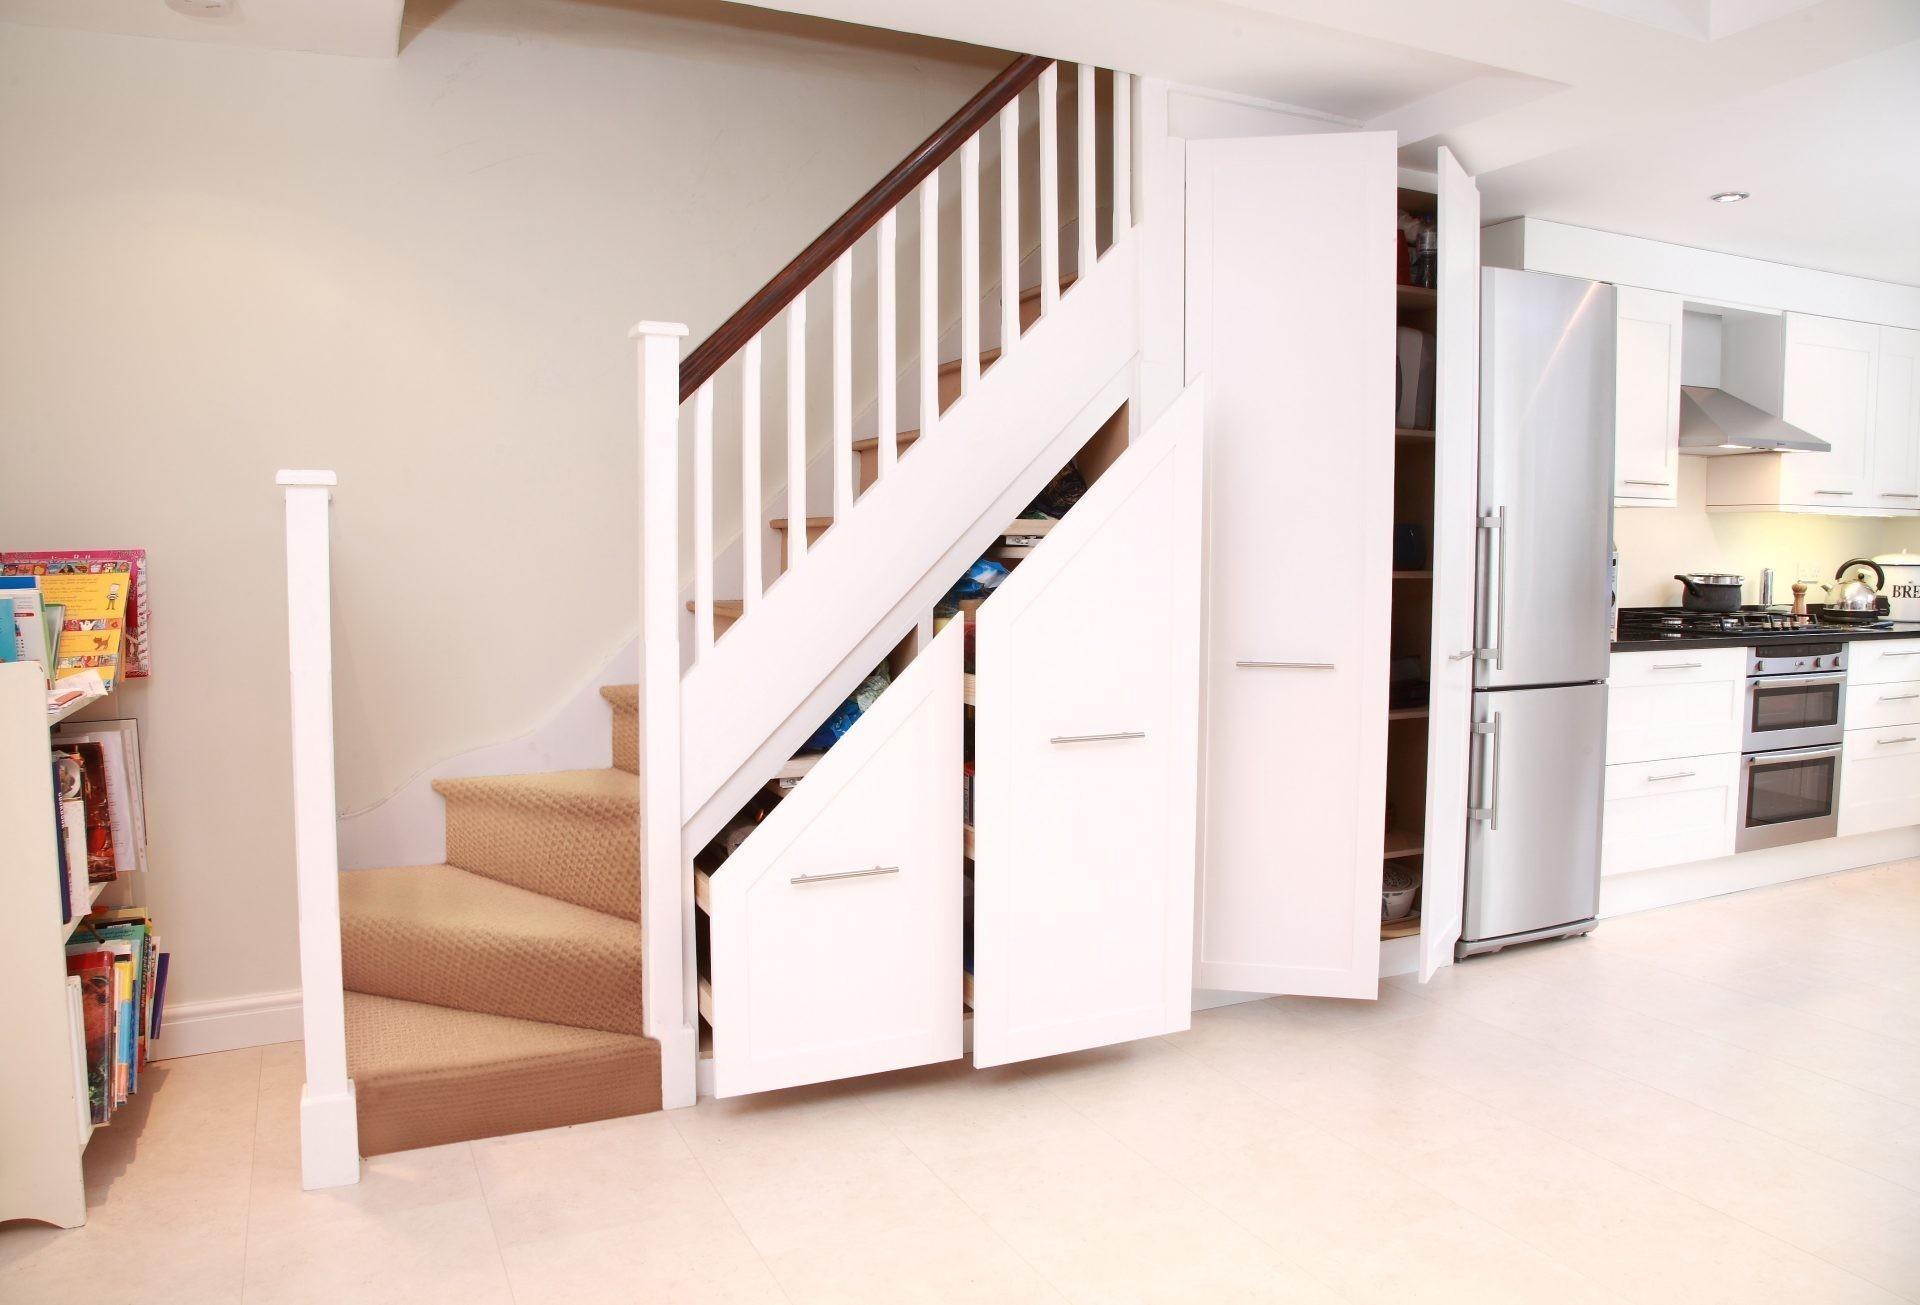 32 Dream Under Stair Storage That You Should See Today Inspire | Modern Under Stairs Storage | Hallway Understairs Storage | Grey | Home Stair | Bajo | Minimal